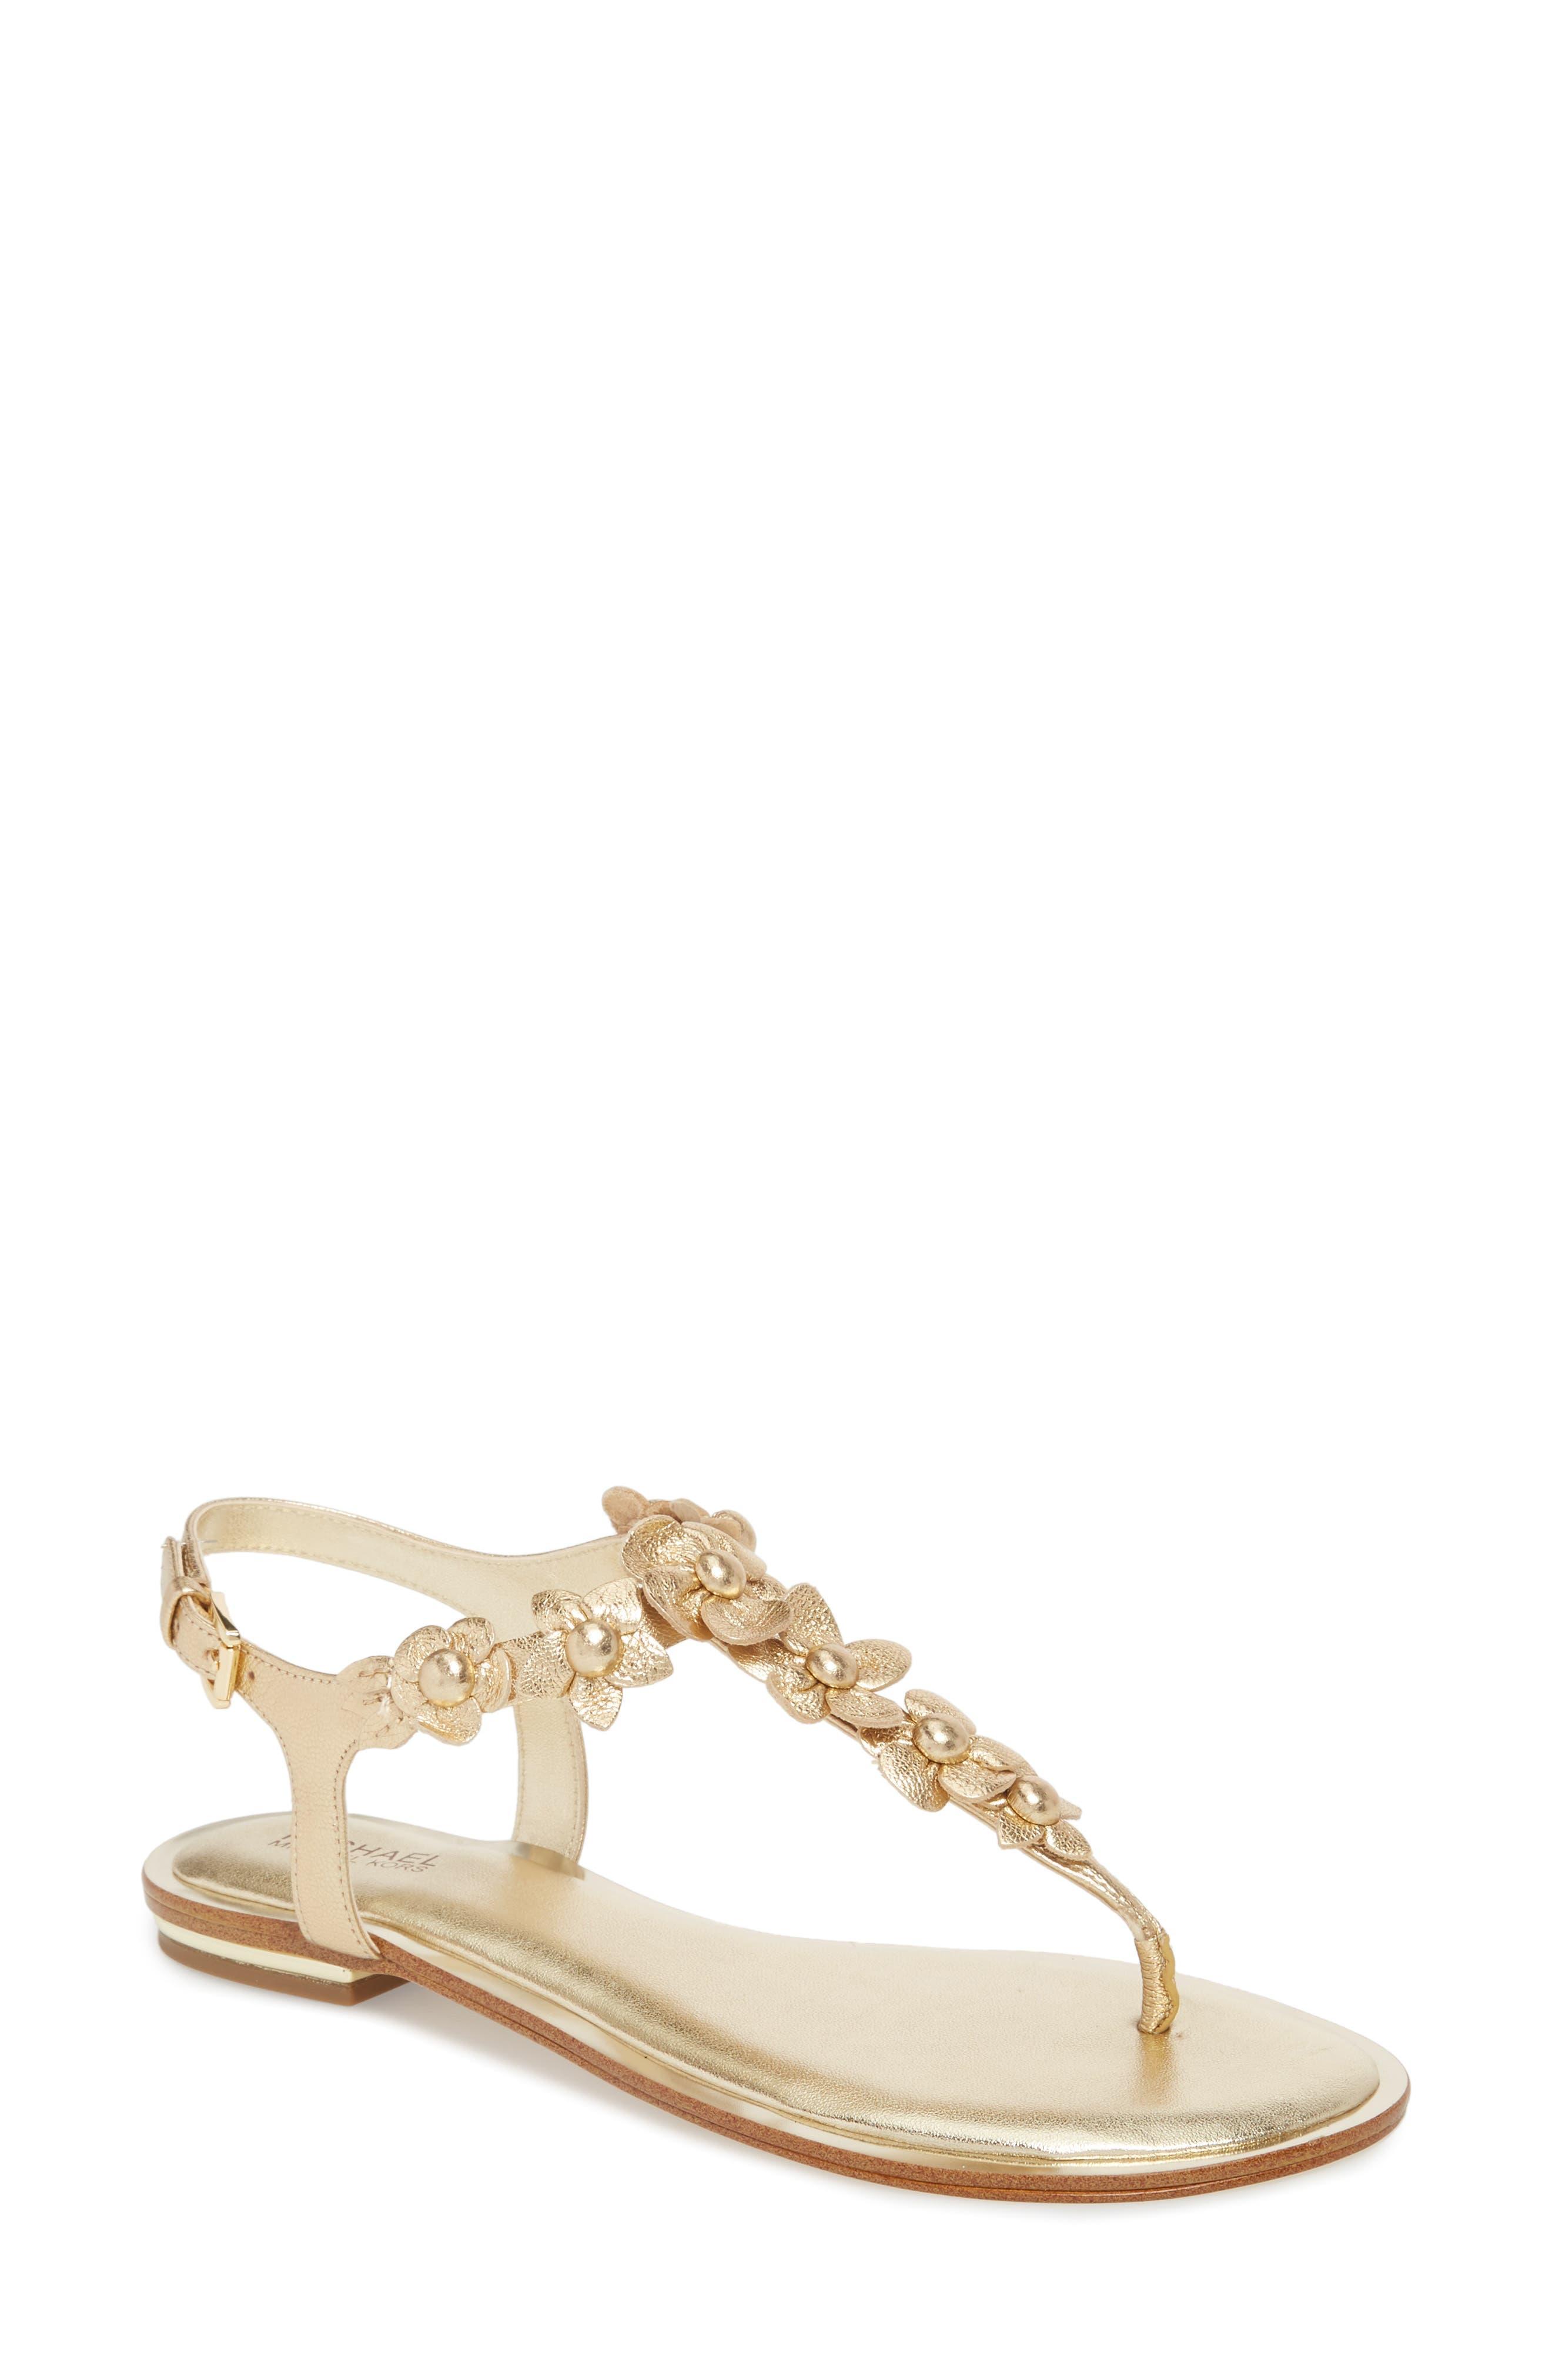 Tricia Sandal by Michael Michael Kors